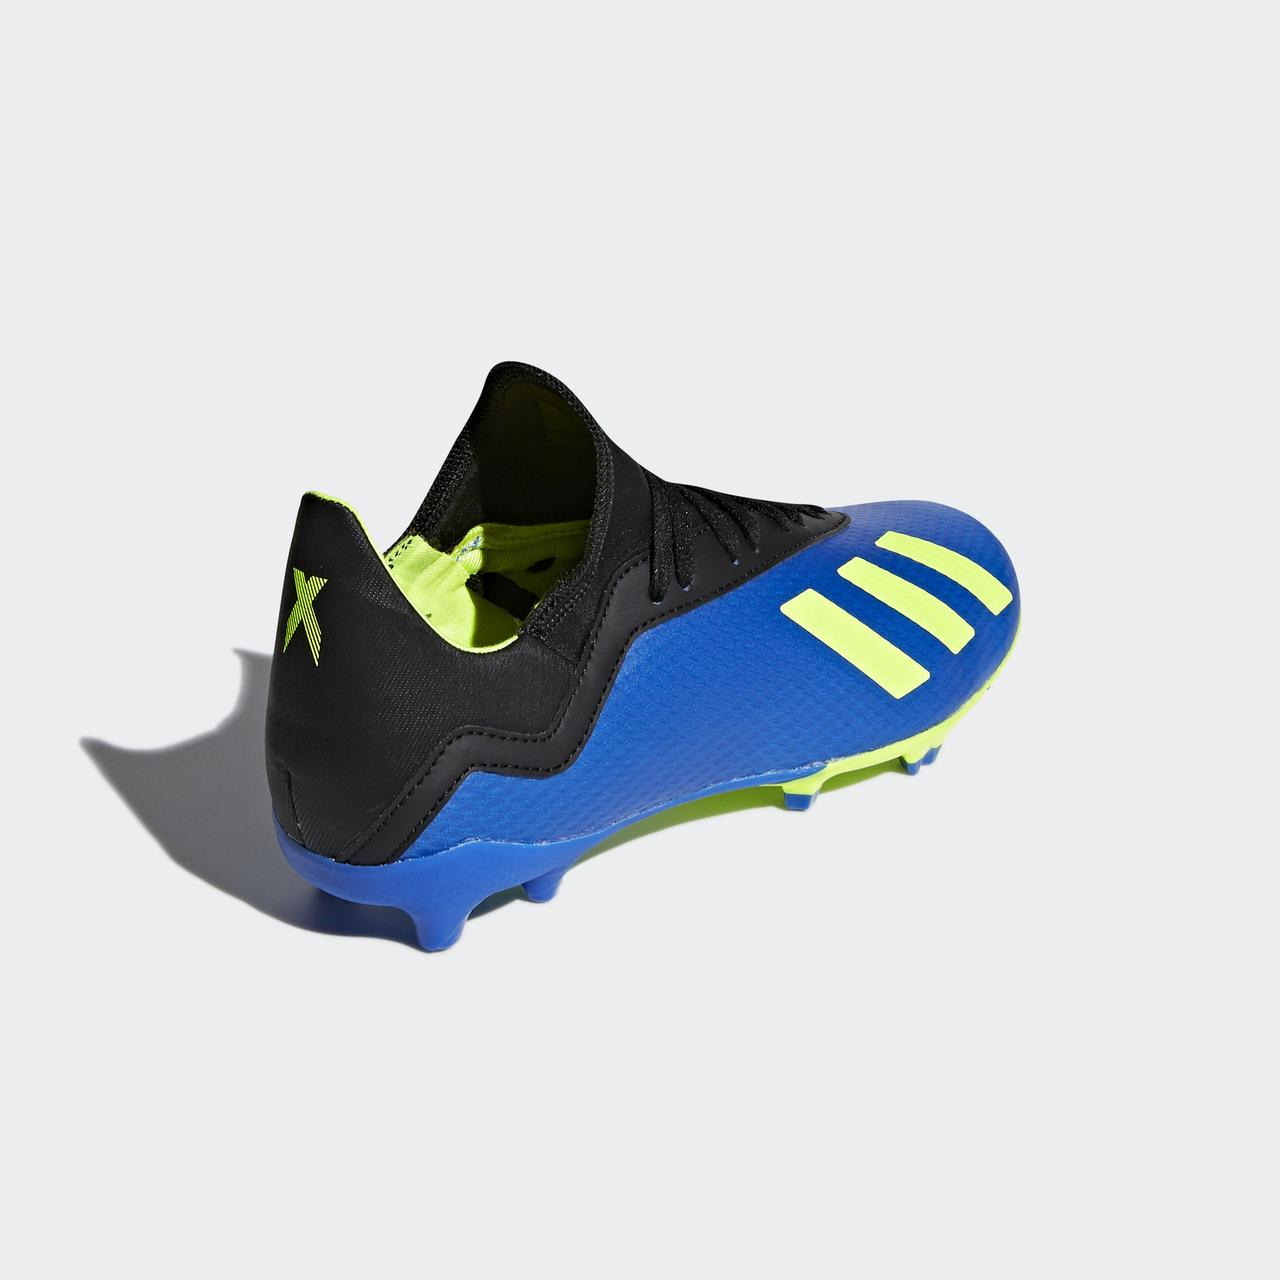 19d55de506f4 ... Детские футбольные бутсы Adidas Performance X 18.3 FG (Артикул   DB2416), ...